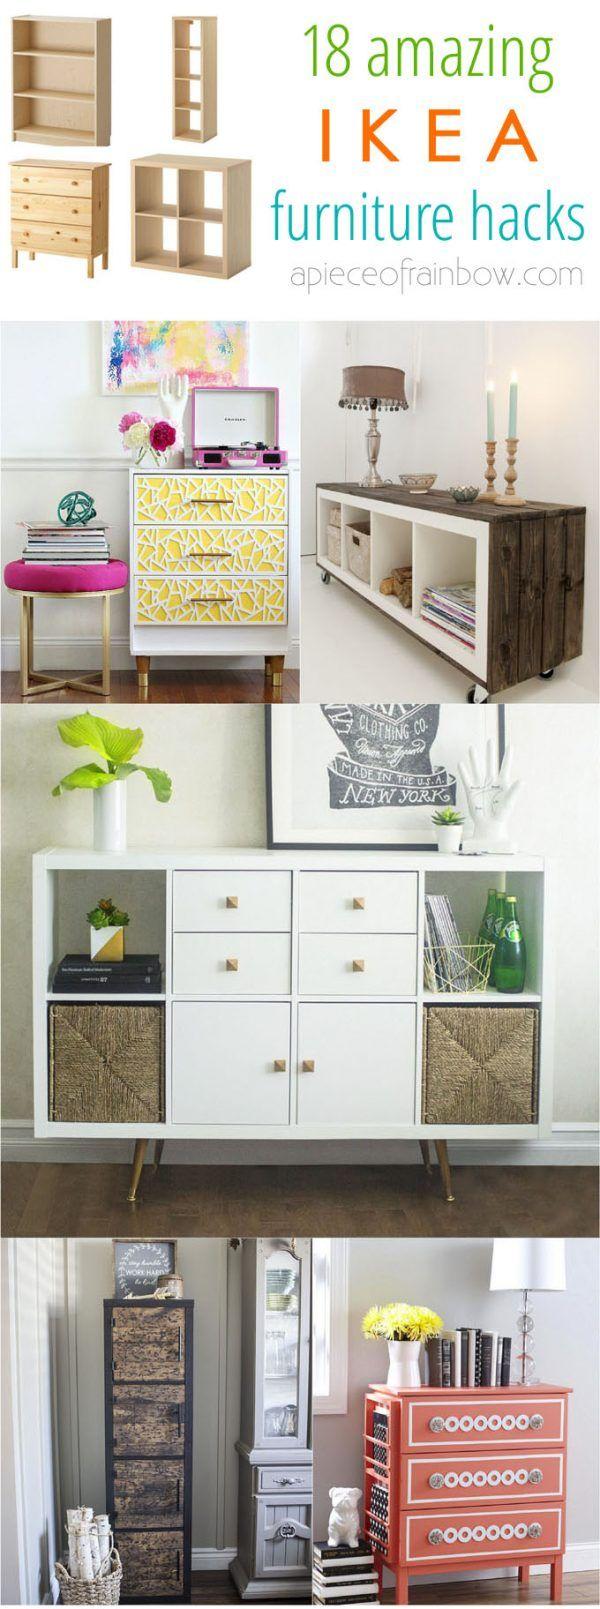 ikea-hacks-custom-furniture-apieceofrainbow-13